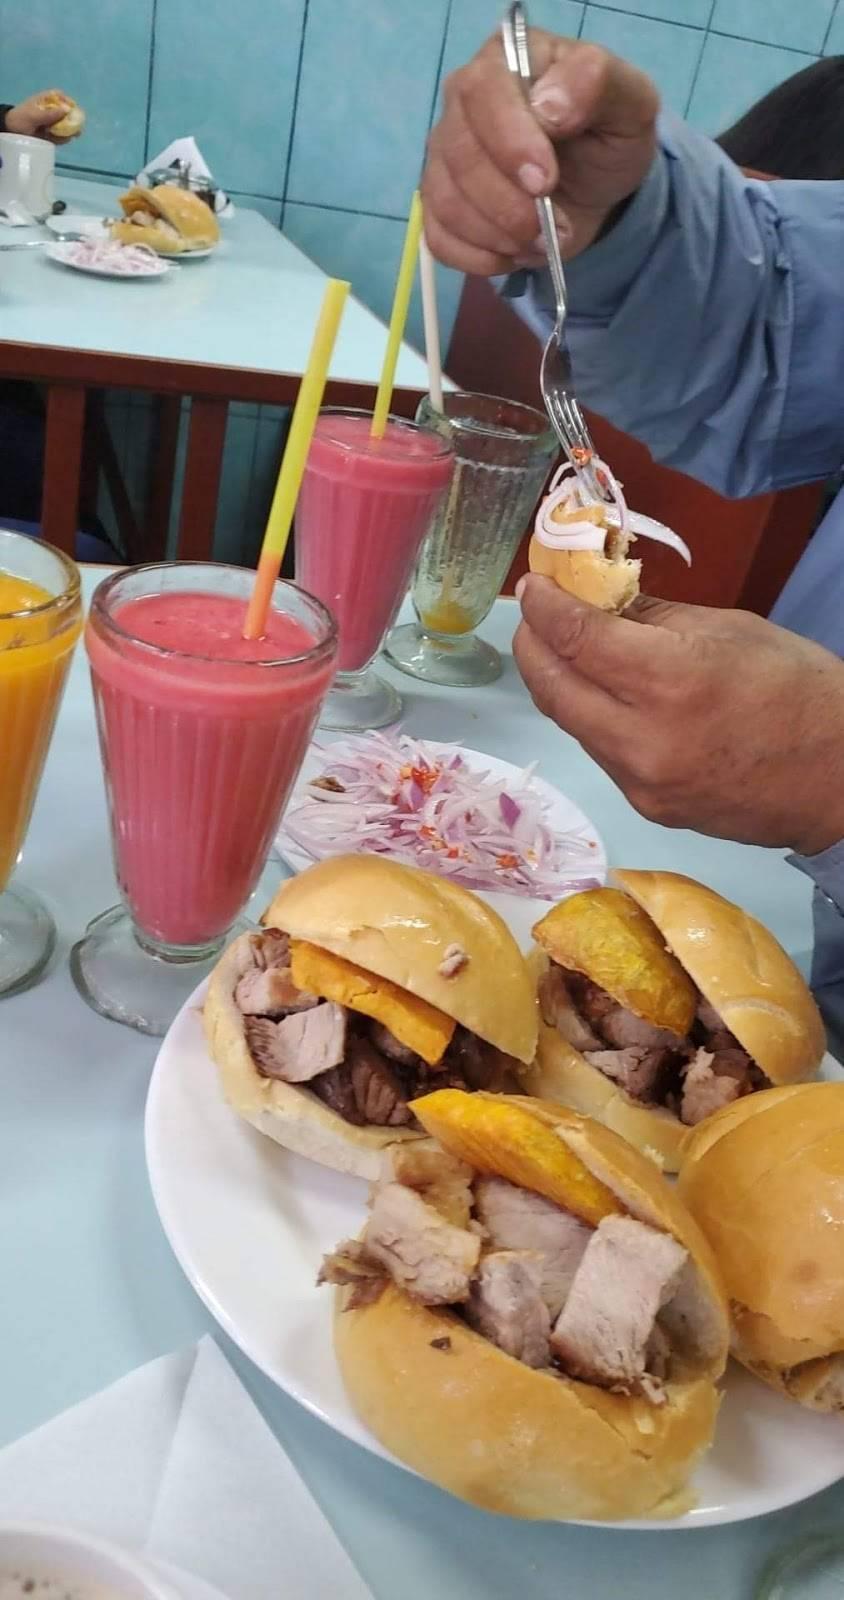 Chimpun Callao   restaurant   274 Main St, West Orange, NJ 07052, USA   9736097750 OR +1 973-609-7750